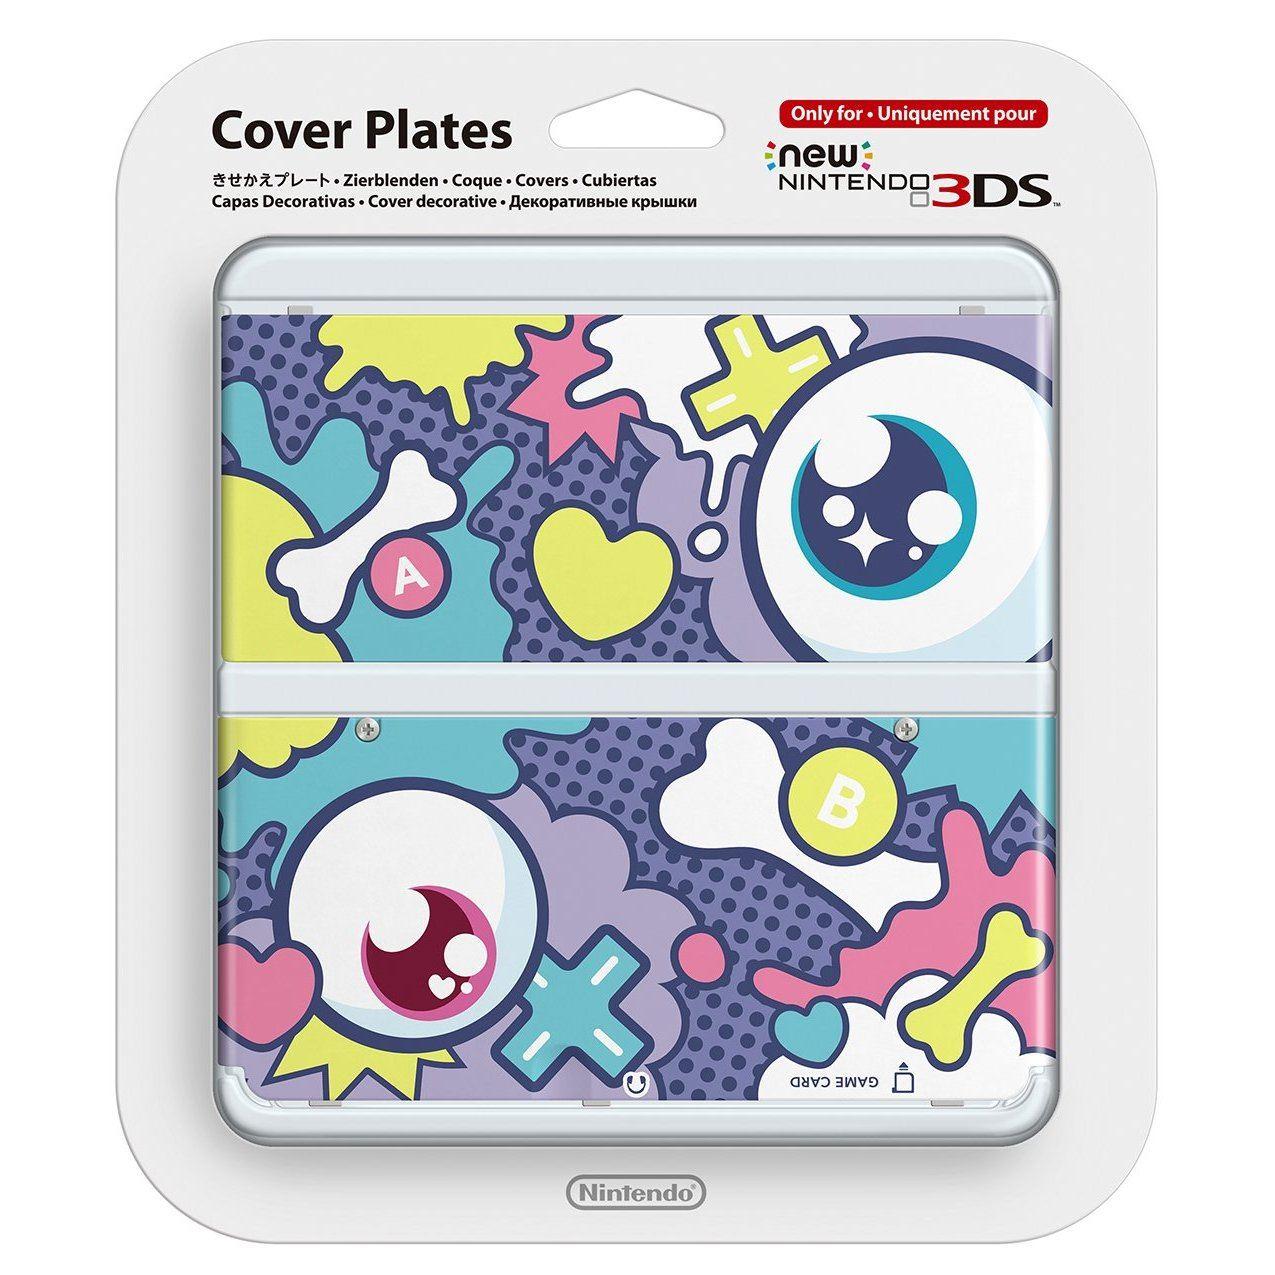 http://s.pacn.ws/1500/lj/new-nintendo-3ds-cover-plates-no-052-kyarypamyupamyu-design-eyeb-387513.1.jpg?o2shtv